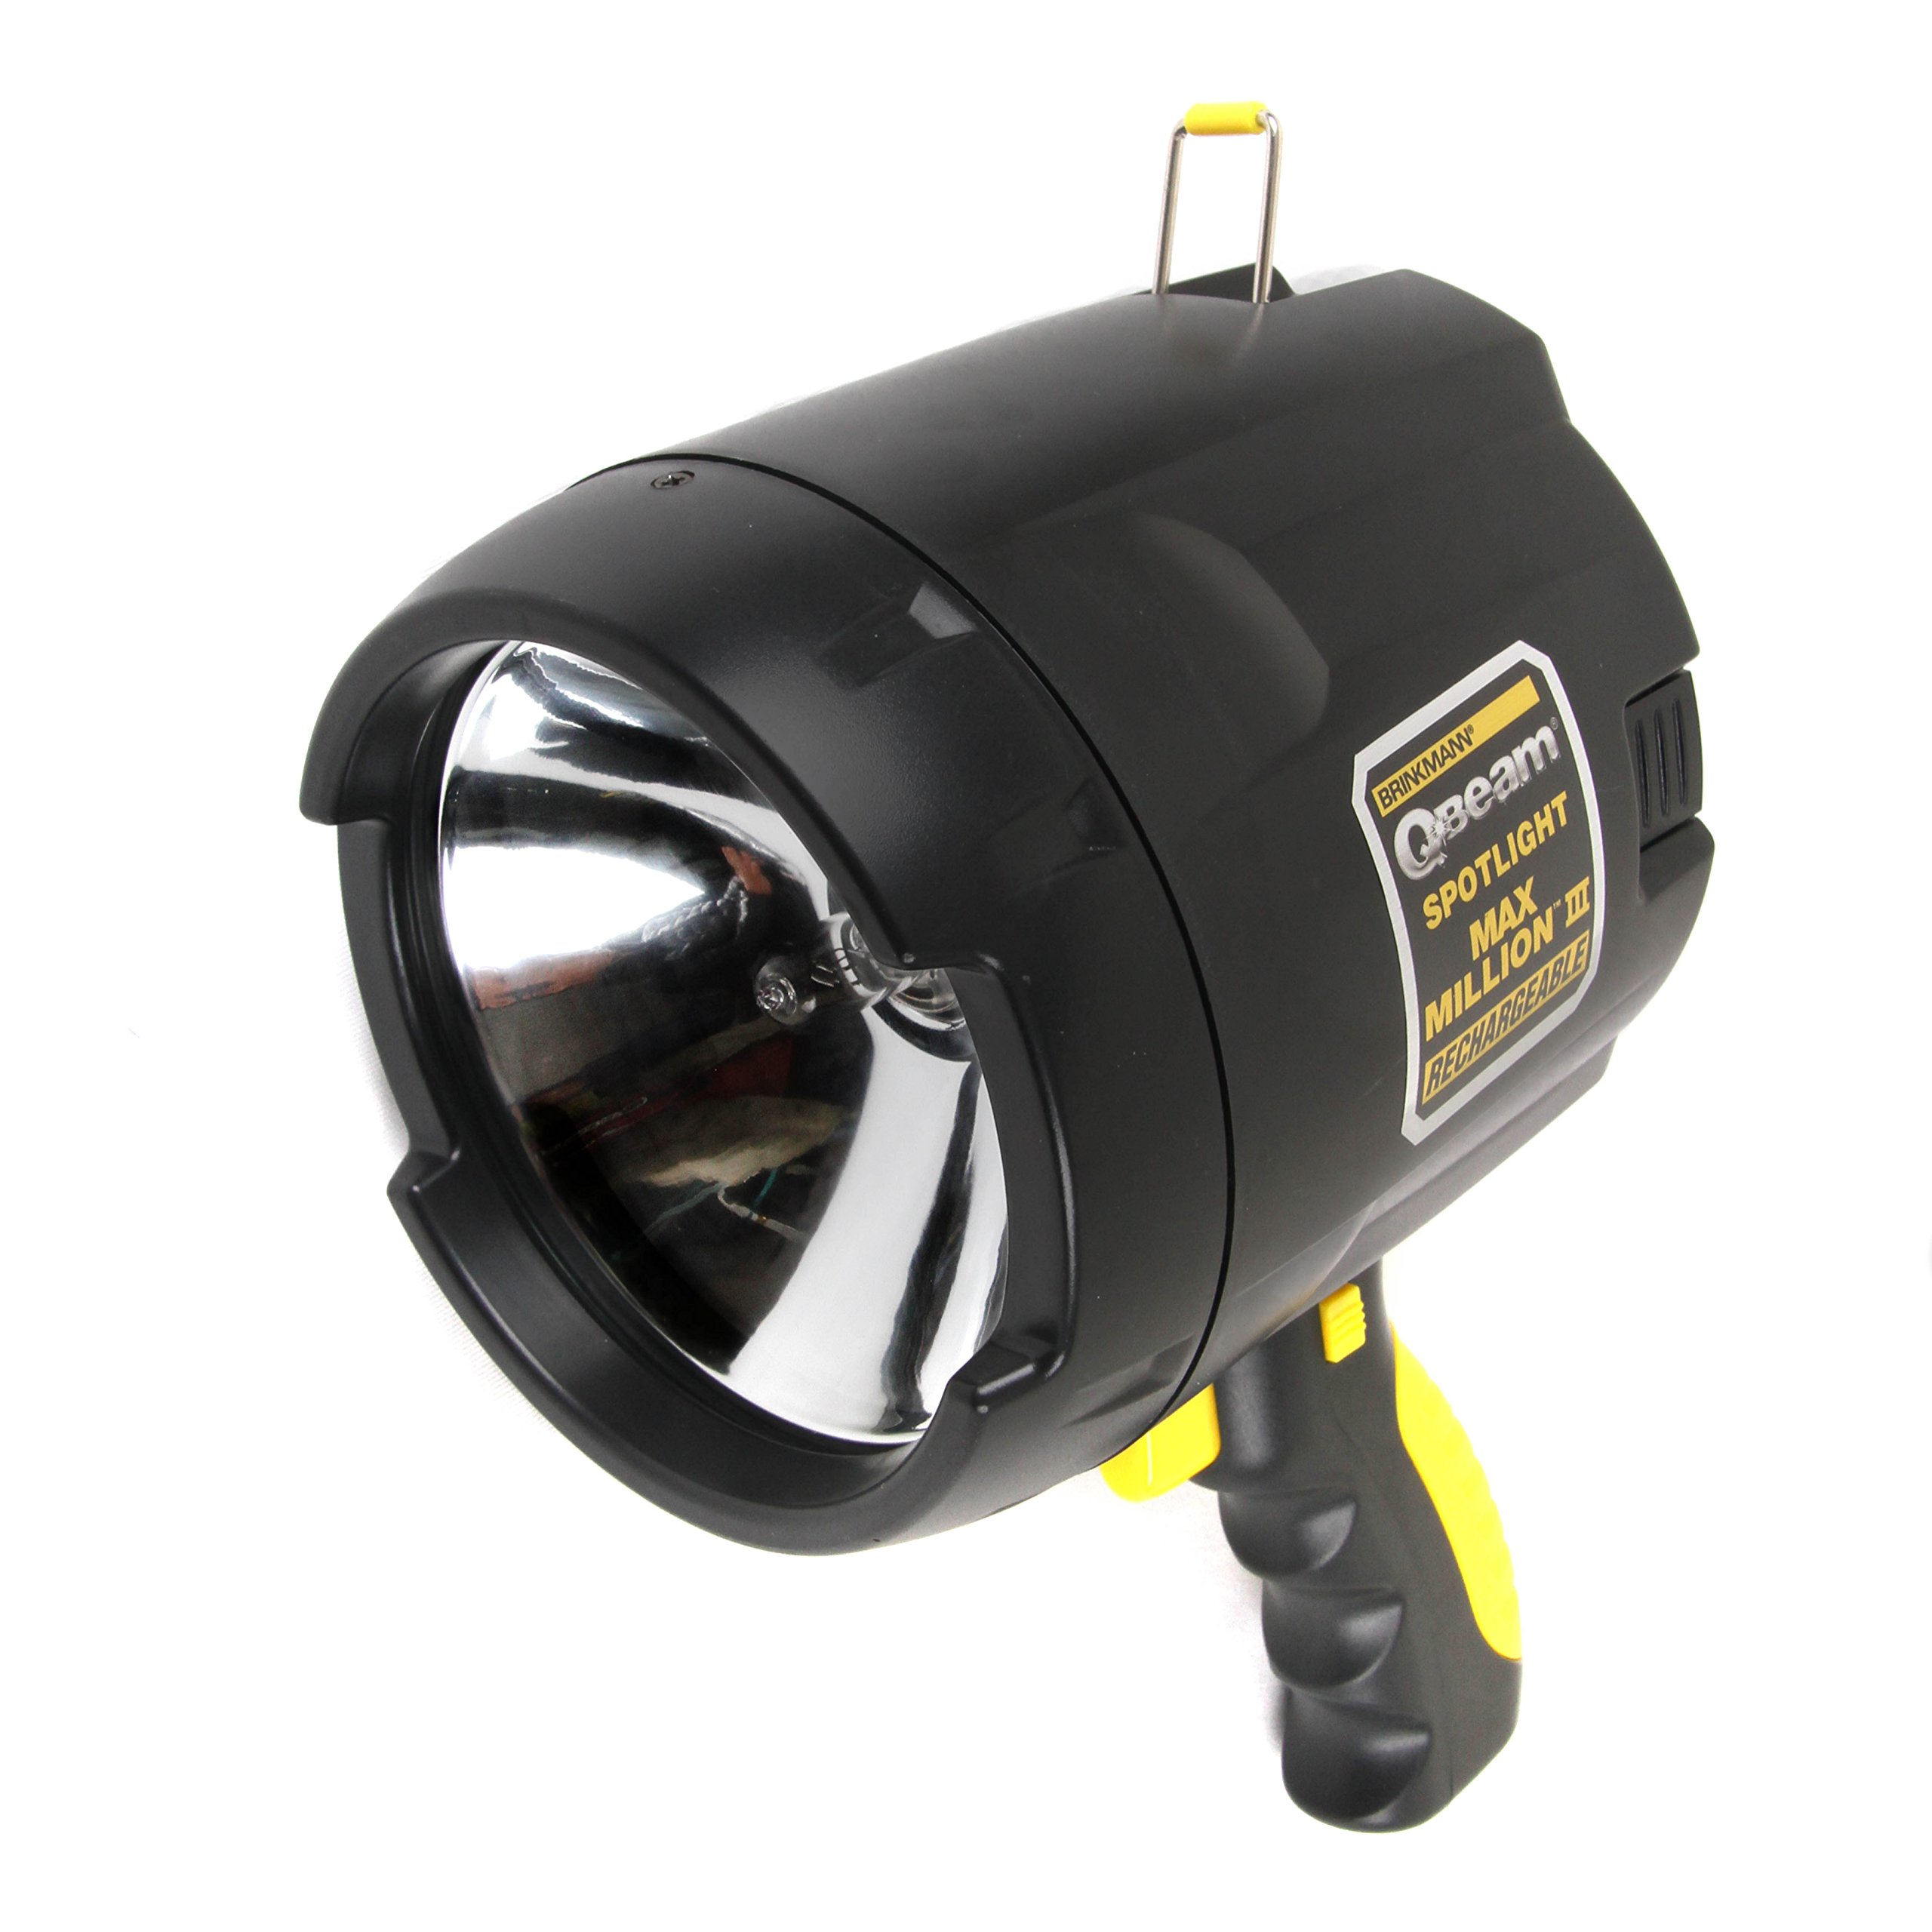 Brinkmann FBA_9507440 QBeam 800-2380-W Max Million III Rechargeable Spotlight Offroad Automotive/Garage/Emergency/Boating/Fishing/Hunting/Camping/Hiking/Patrolling